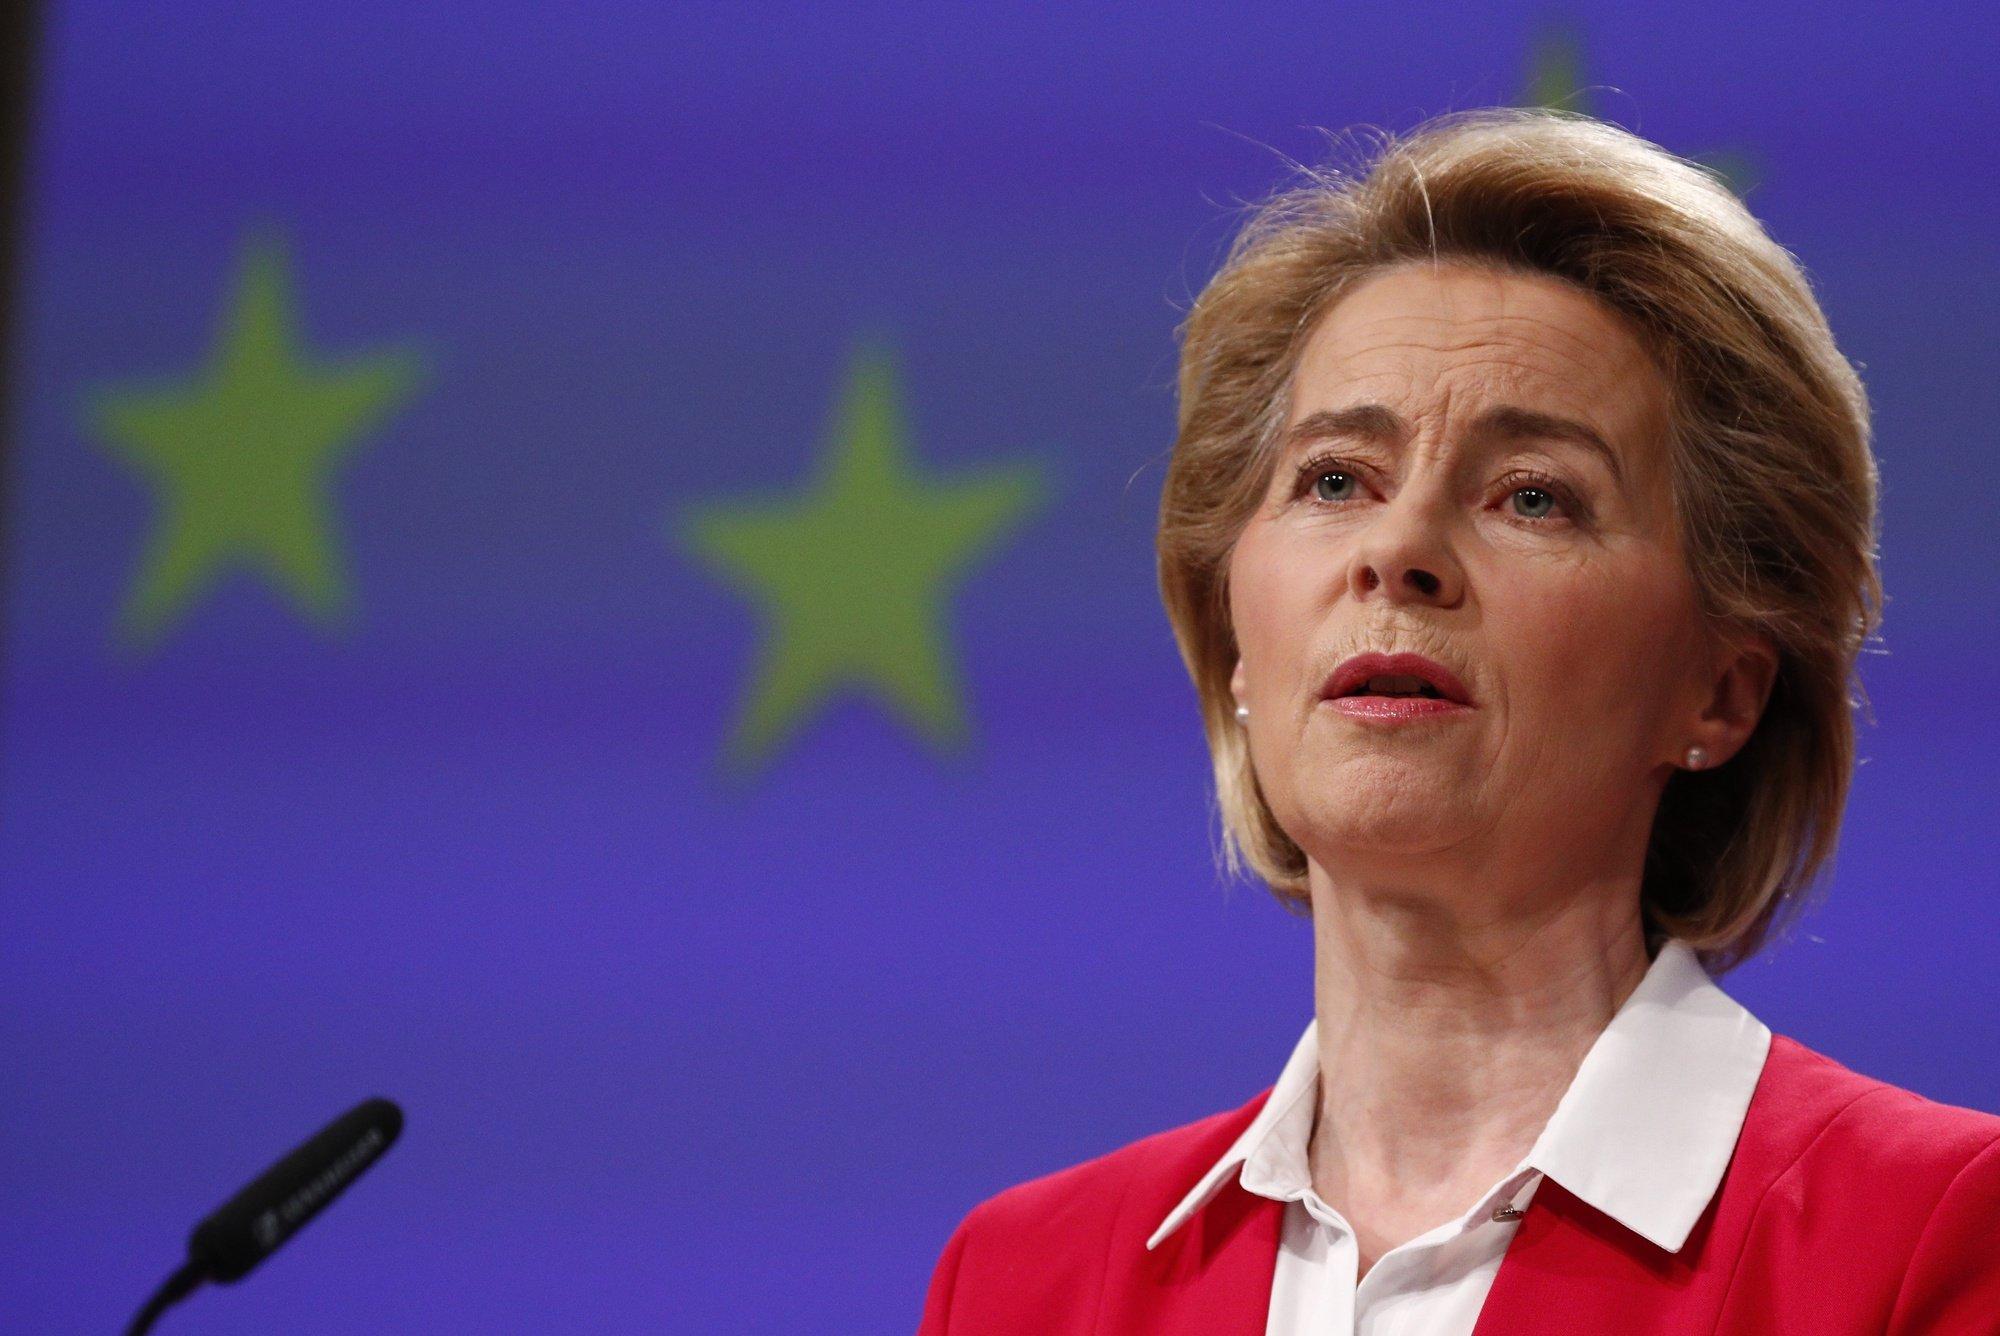 epa08338401 European Commission President Ursula von der Leyen holds a news conference detailing EU efforts to limit economic impact of the coronavirus disease (COVID-19) outbreak, in Brussels, Belgium, 02 April 2020.  EPA/FRANCOIS LENOIR / POOL